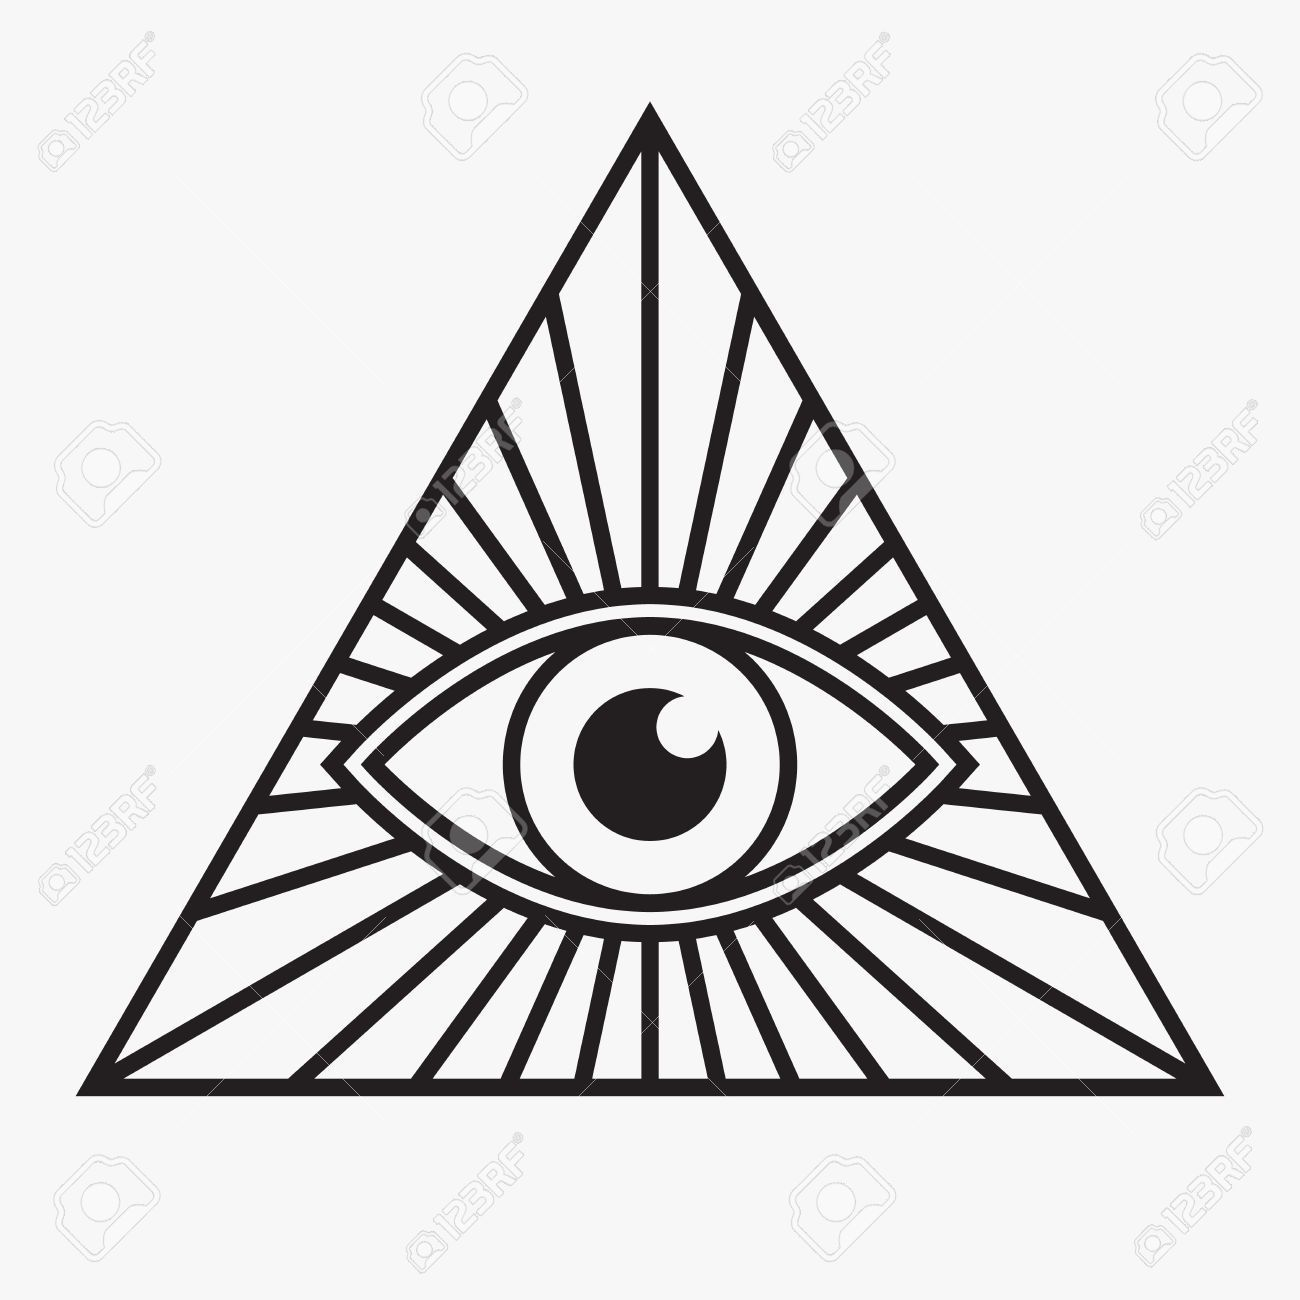 all seeing eye symbol vector illustration royalty free cliparts rh pinterest com Star of David Holocaust White Star Clip Art